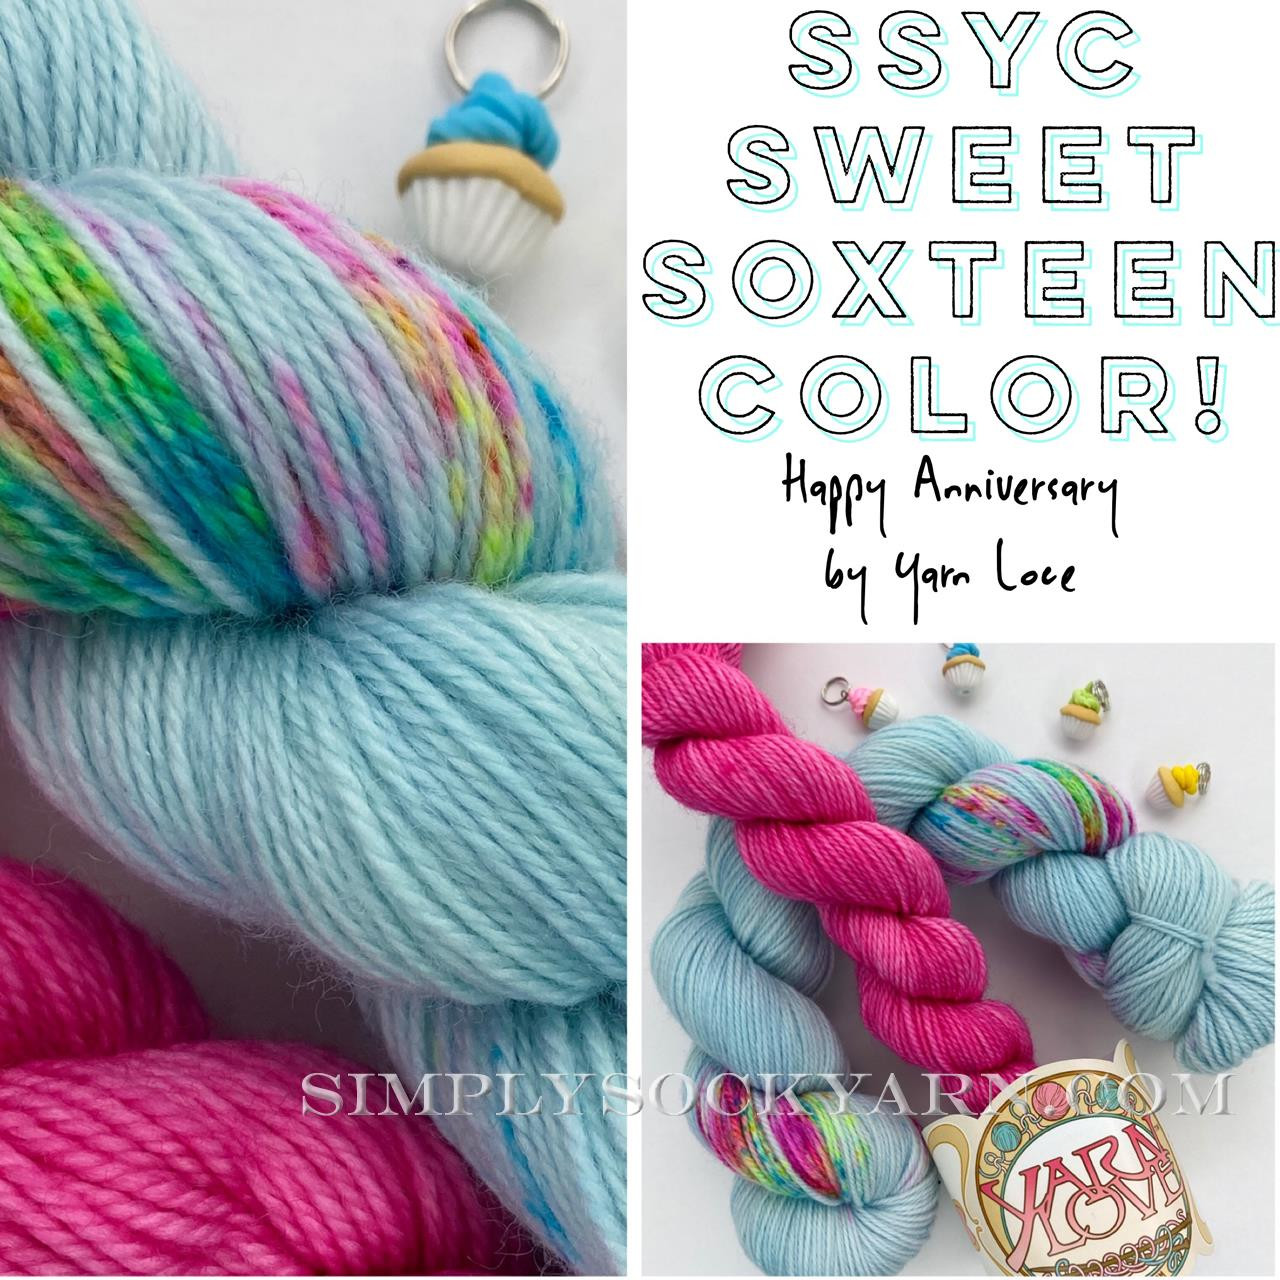 SSYC Sweet Soxteen - 2 -